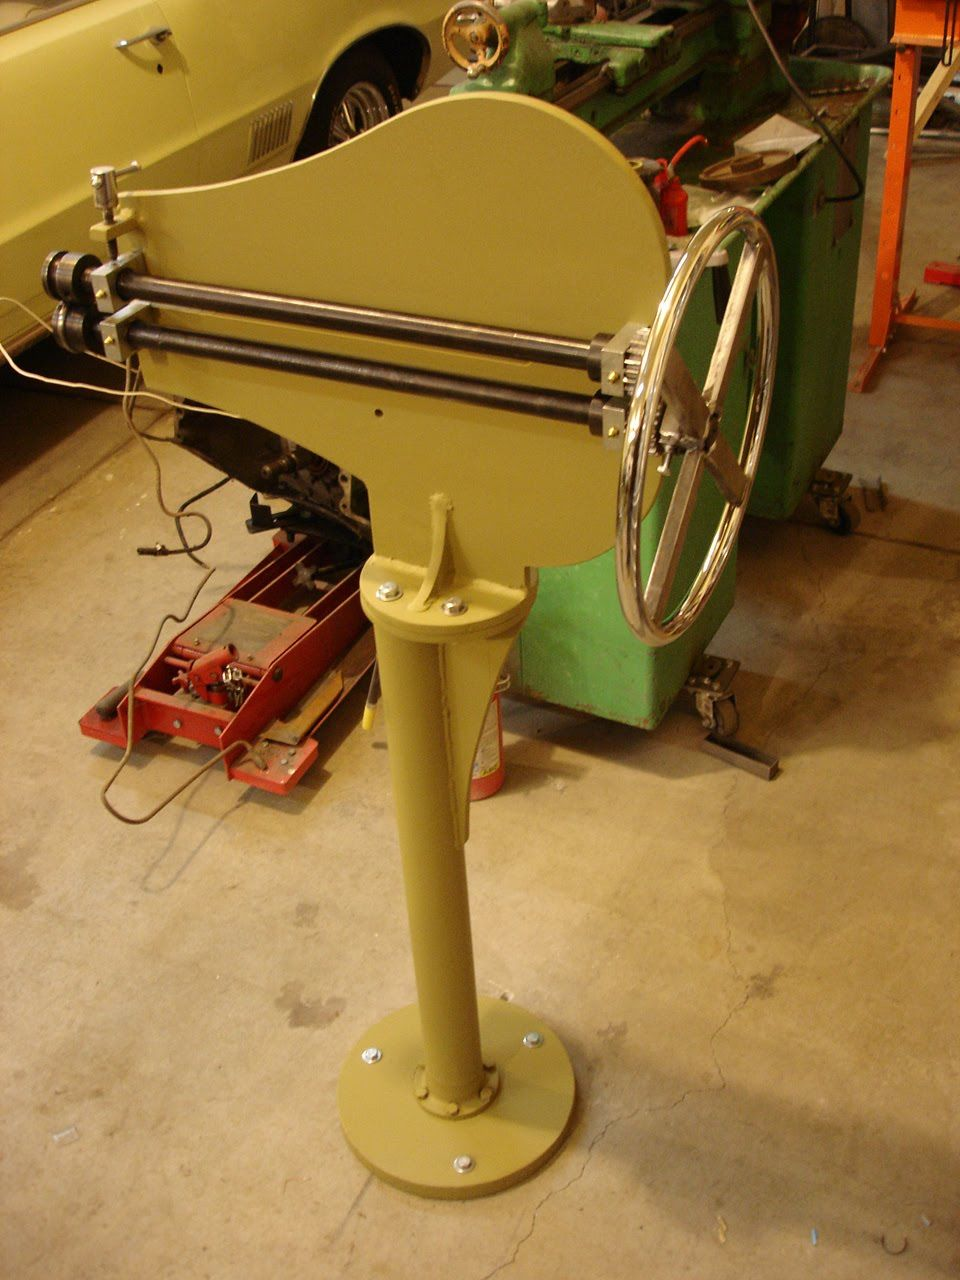 Bead Roller Tools Projekte Metall Selber Bauen